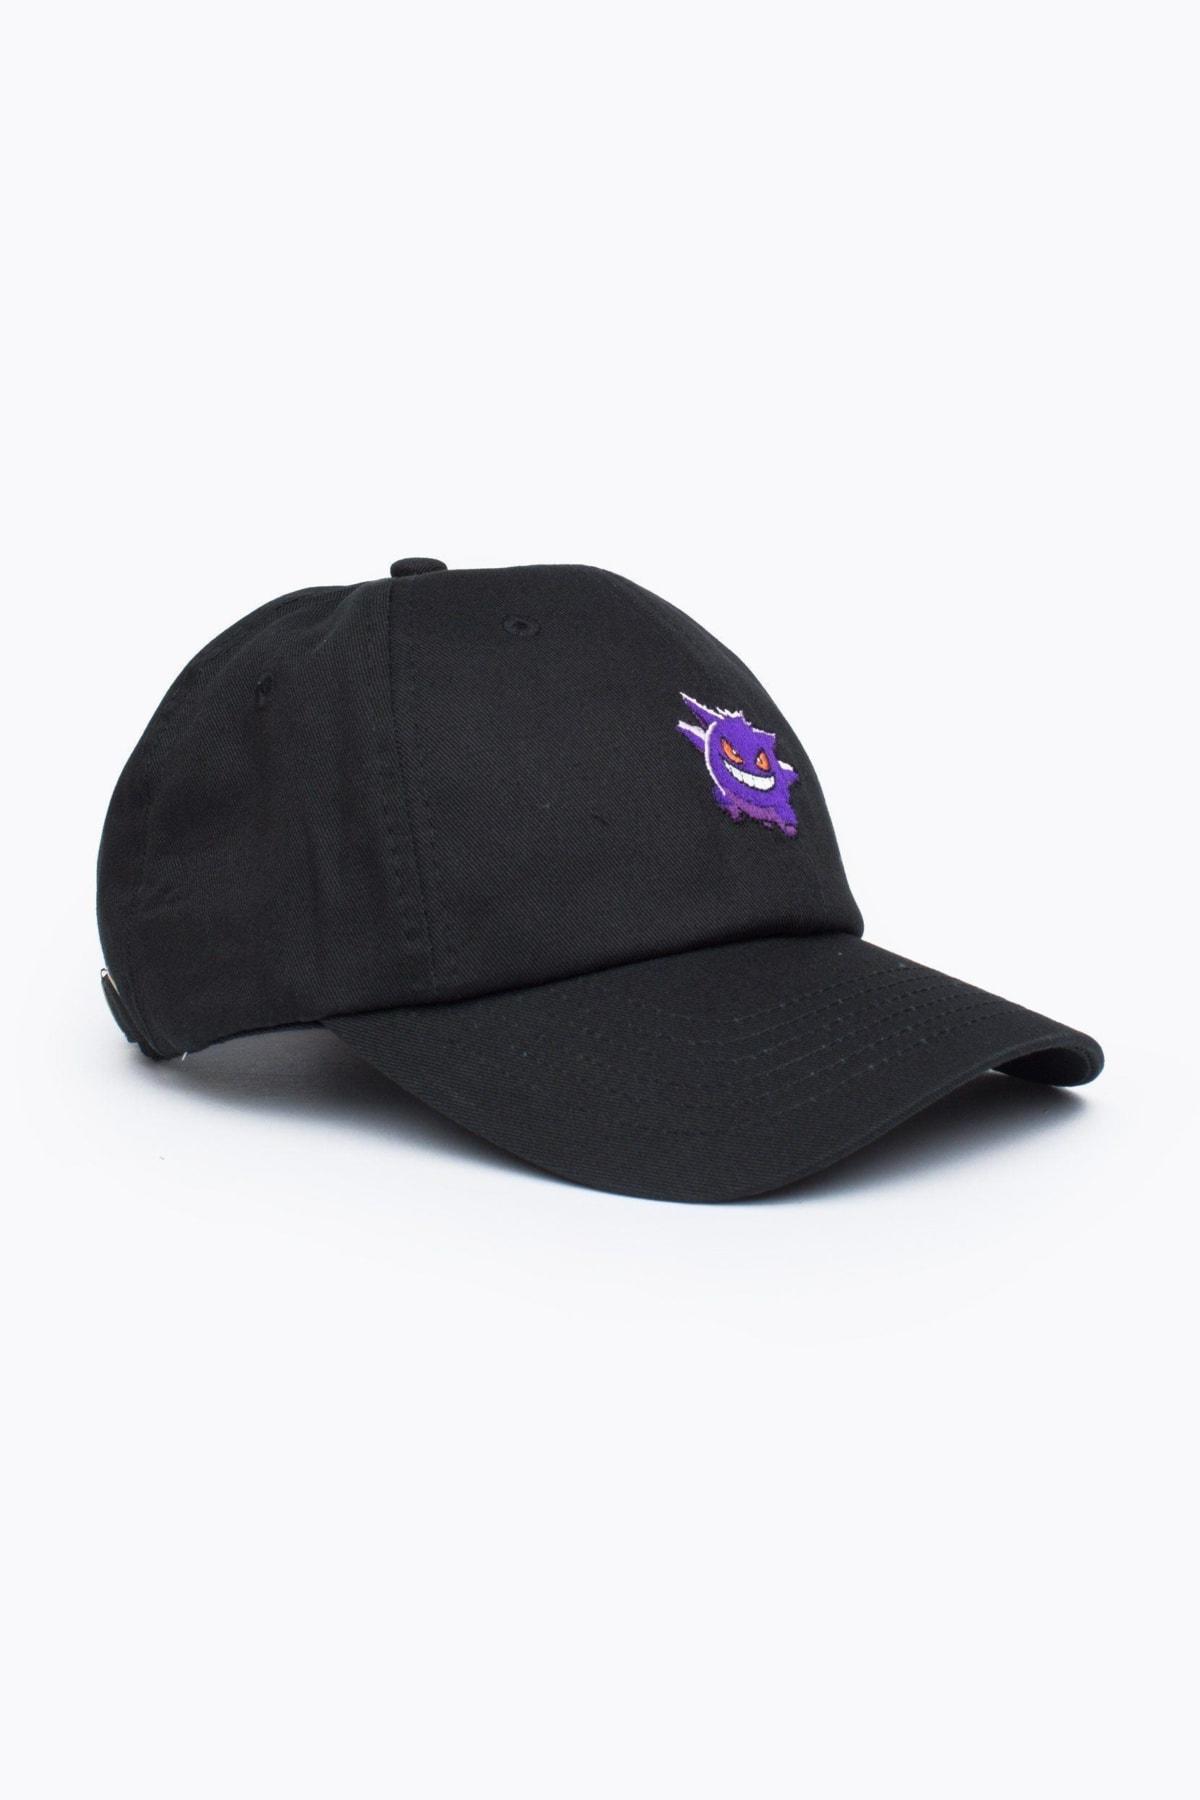 HYPE X Pokemon Black Gengar Dad Hat